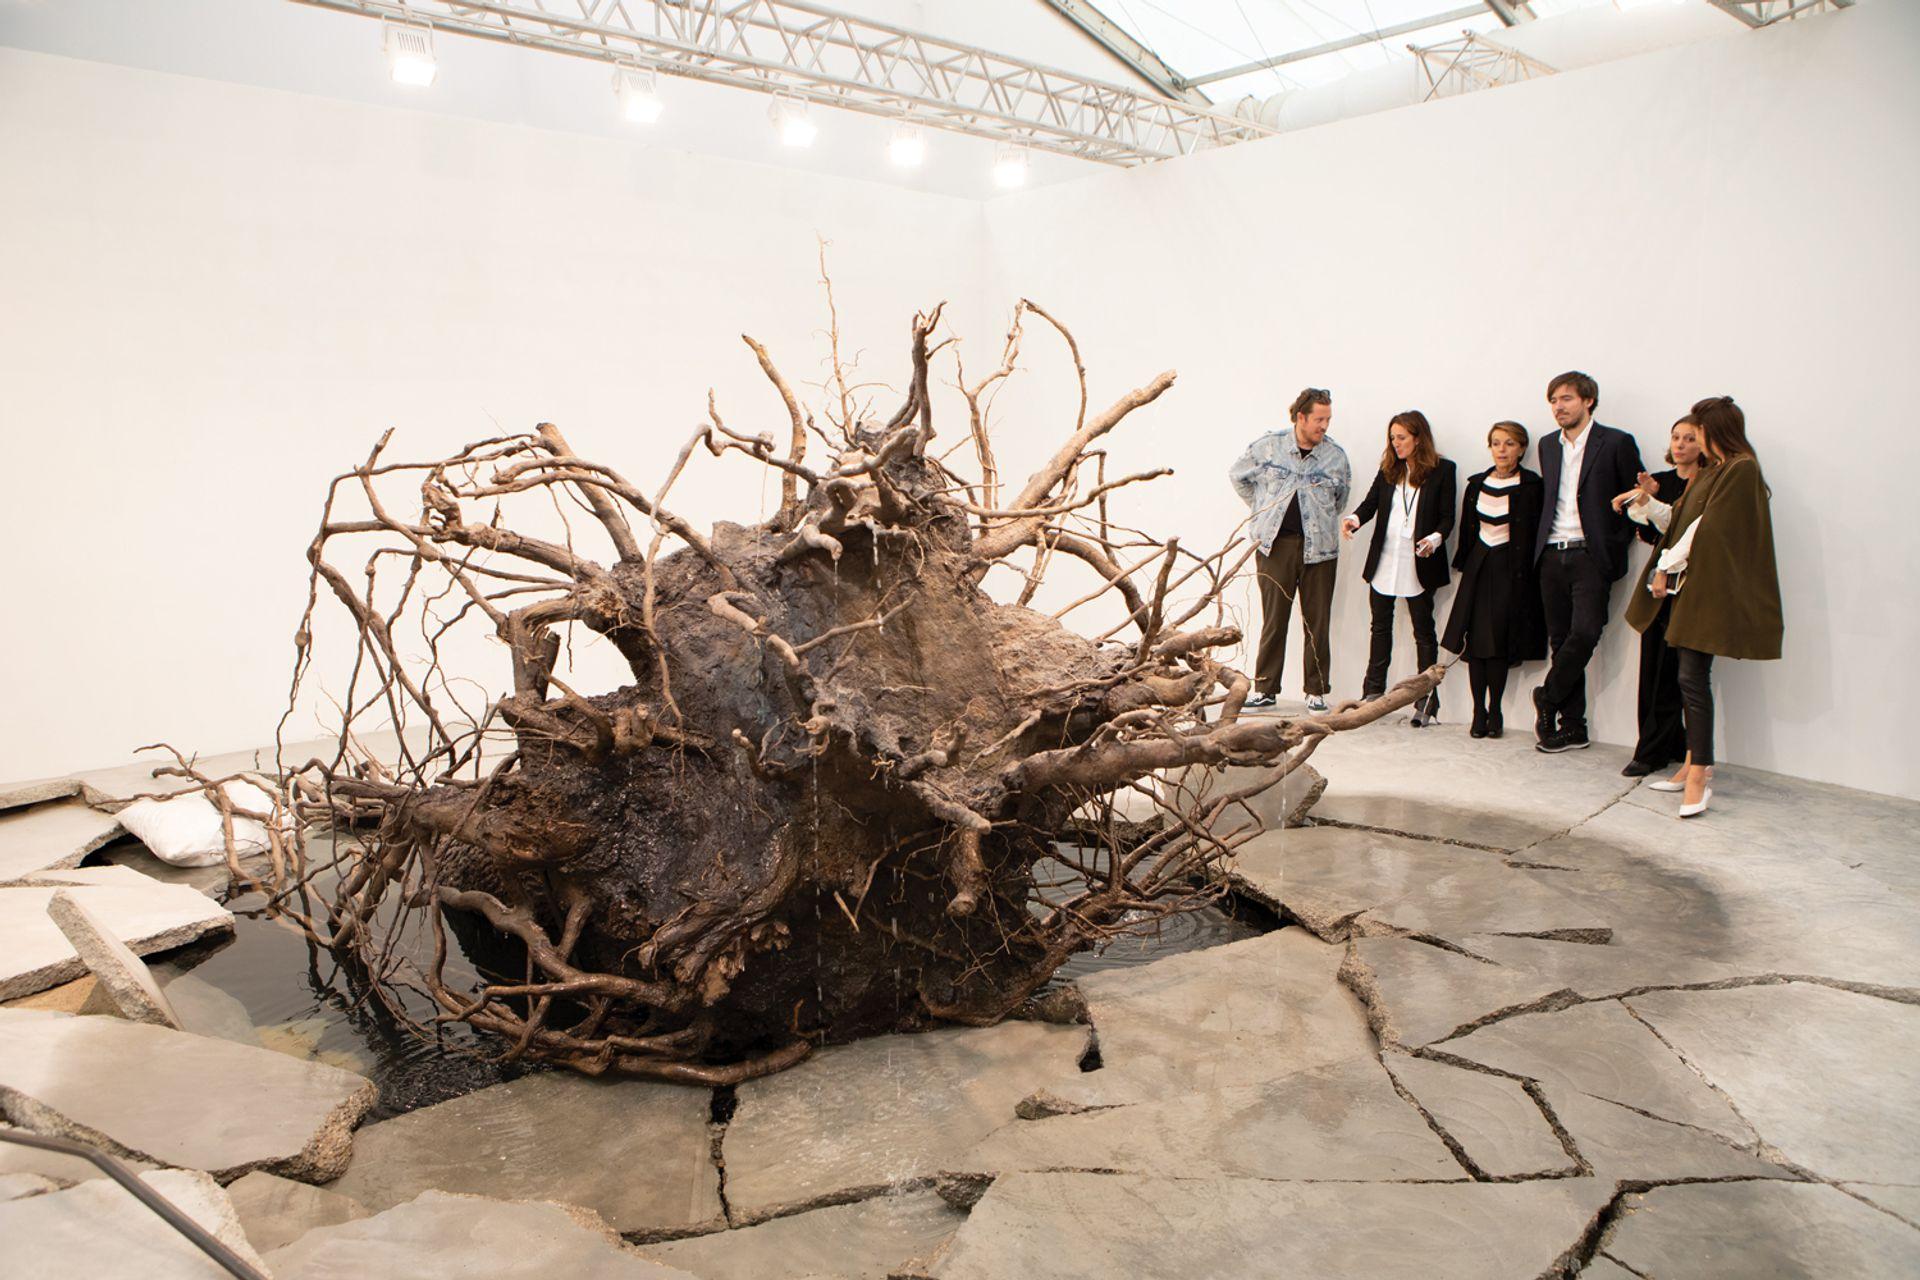 The centrepiece of Tatiana Trouvé's The Shaman (2018) is a 1.2-tonne bronze tree © David Owens/The Art Newspaper